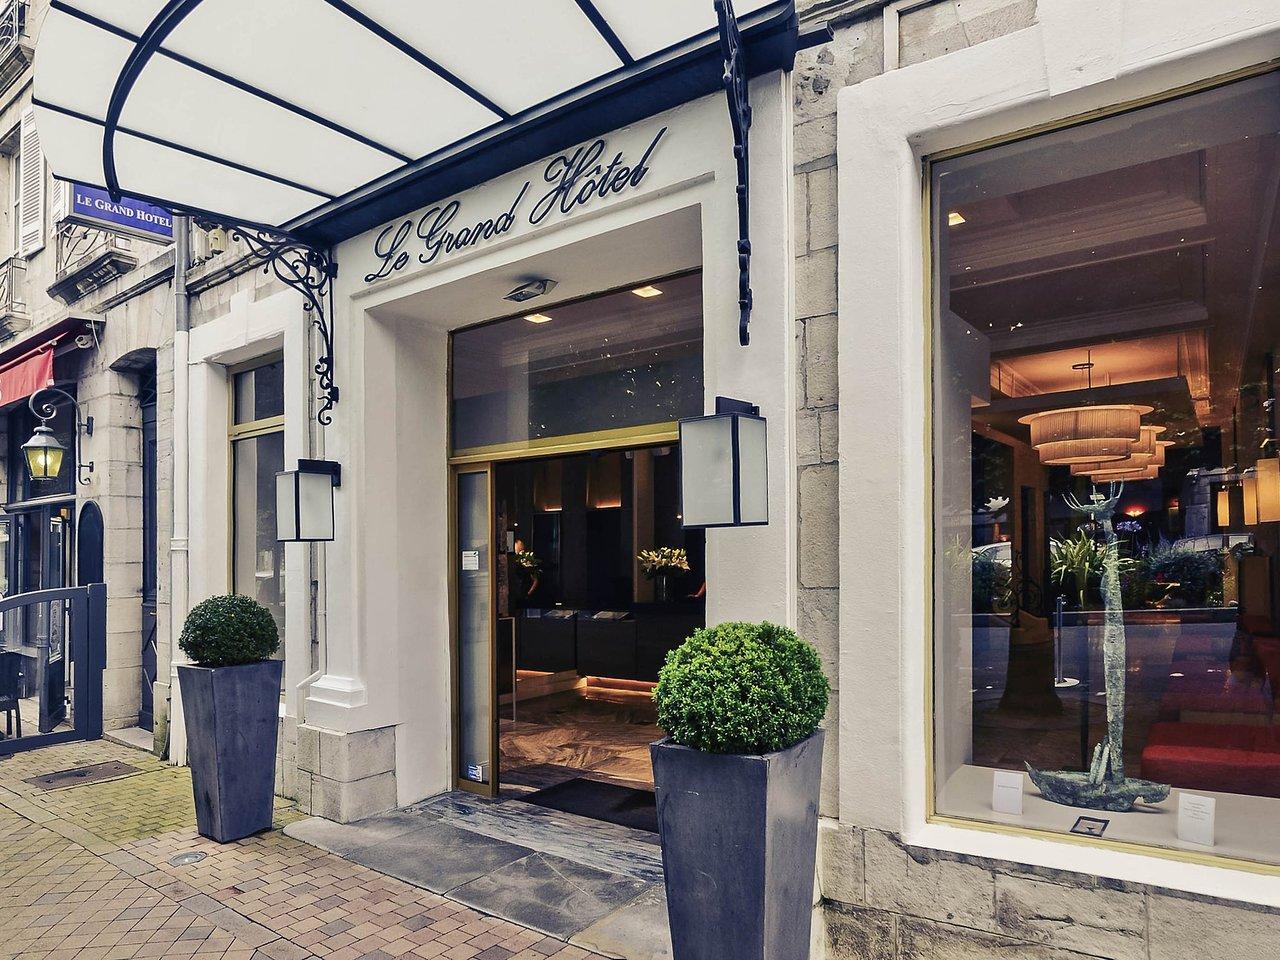 the 10 best family hotels in bayonne of 2019 with prices tripadvisor rh tripadvisor com